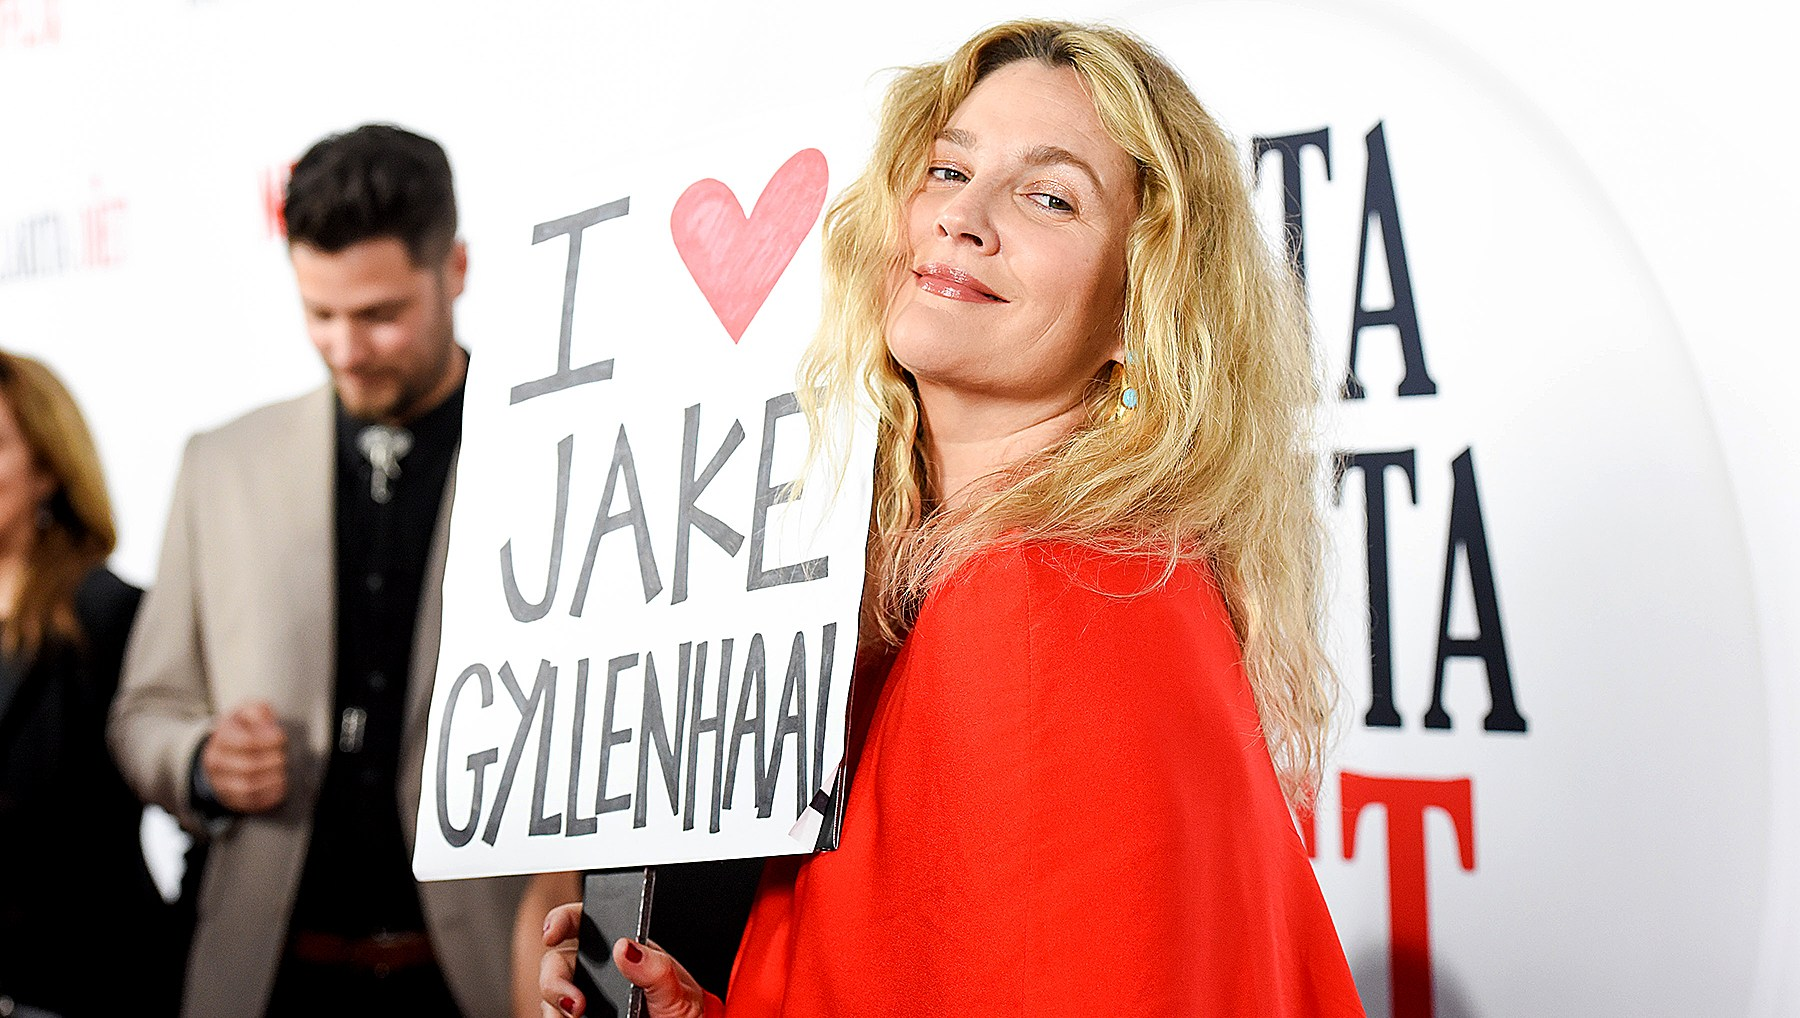 drew-barrymore-jake-gyllenhaal-sign